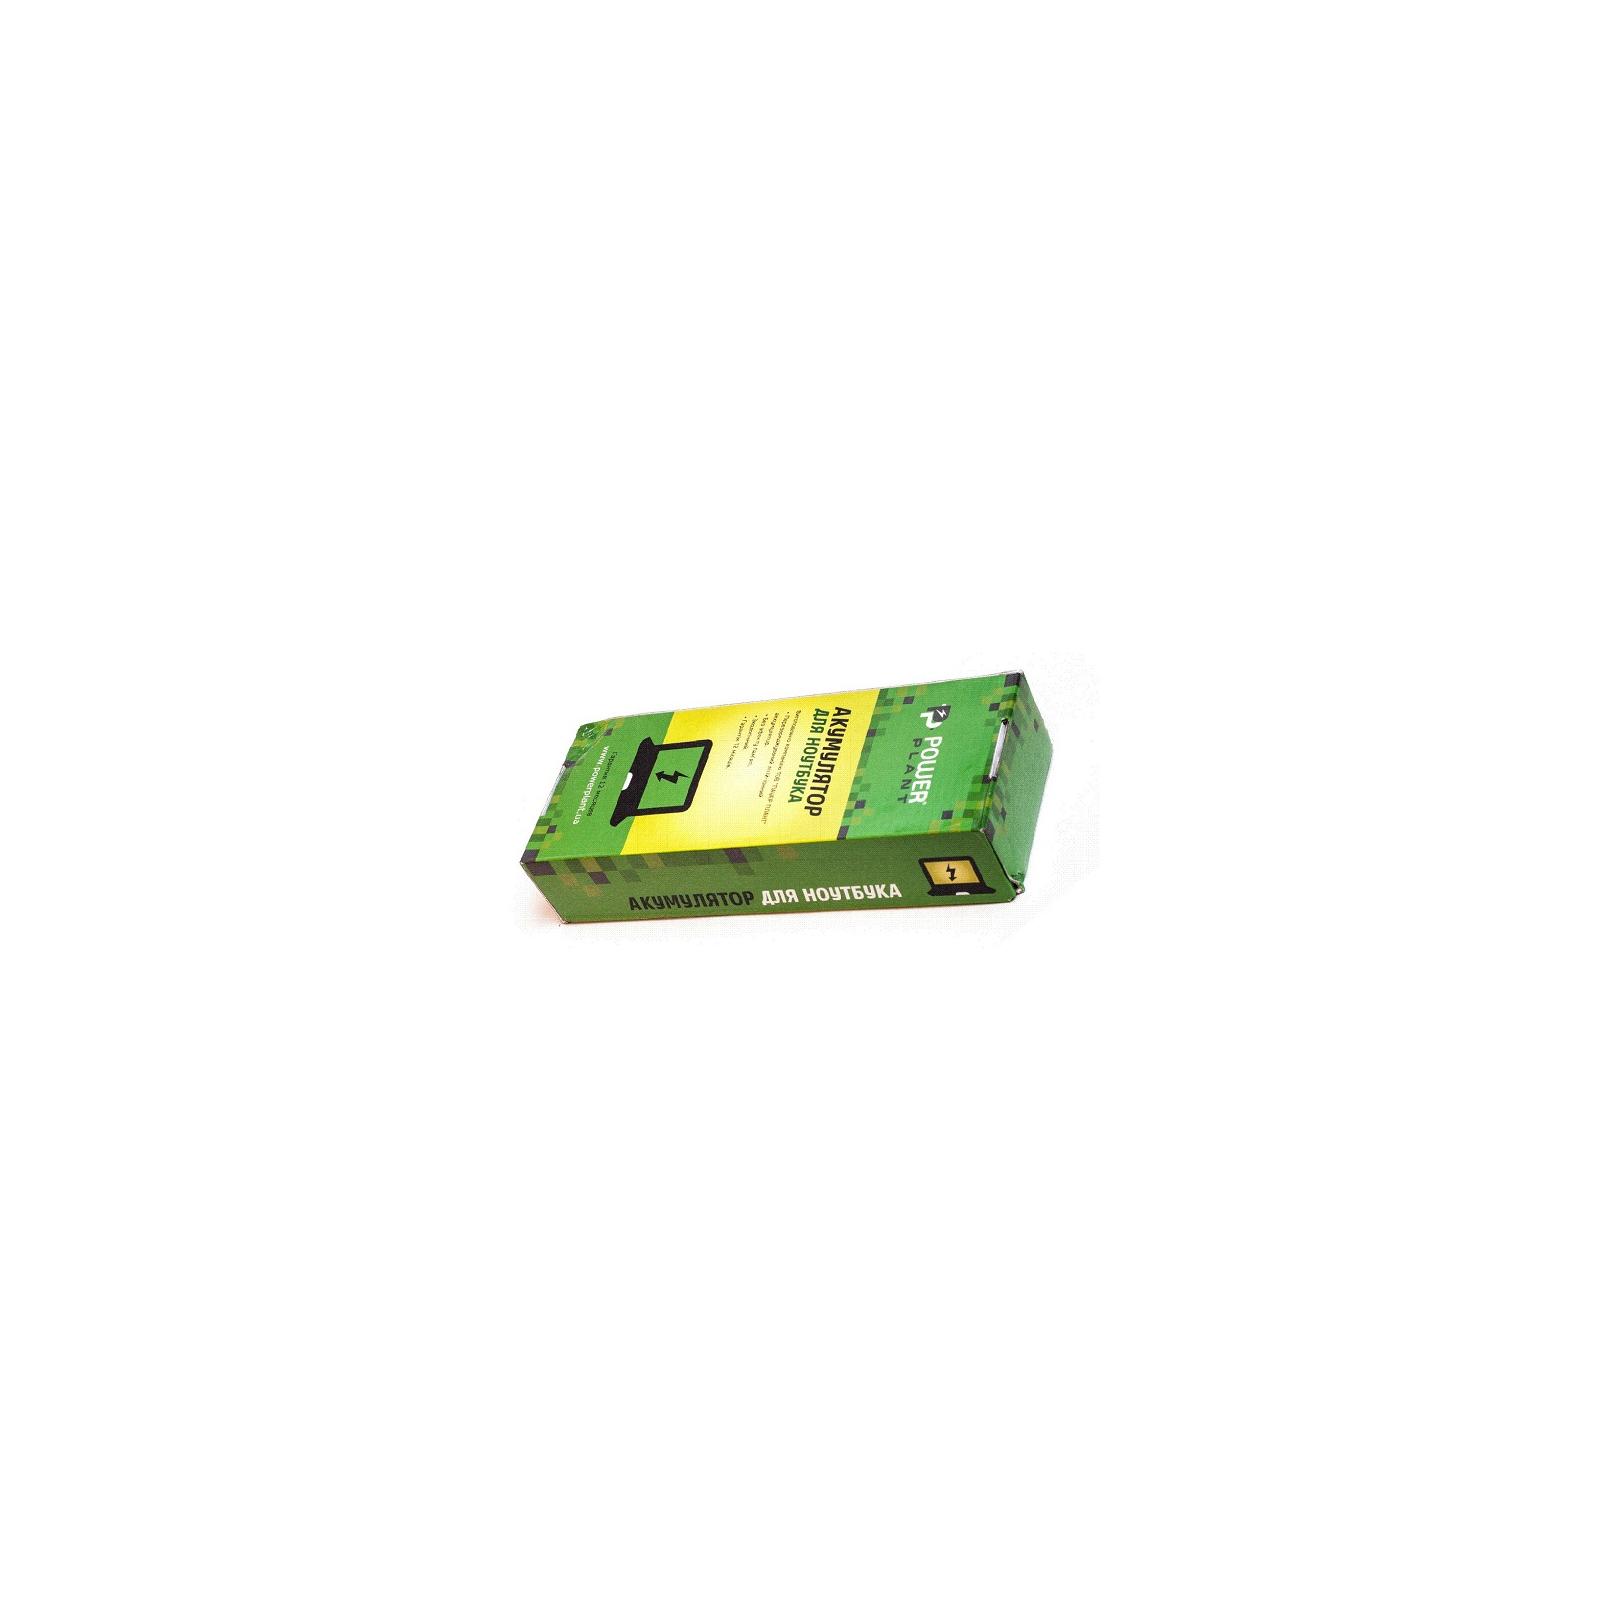 Аккумулятор для ноутбука HP 420 (587706-121, H4320LH) 10.8V 4400mAh PowerPlant (NB00000290) изображение 3